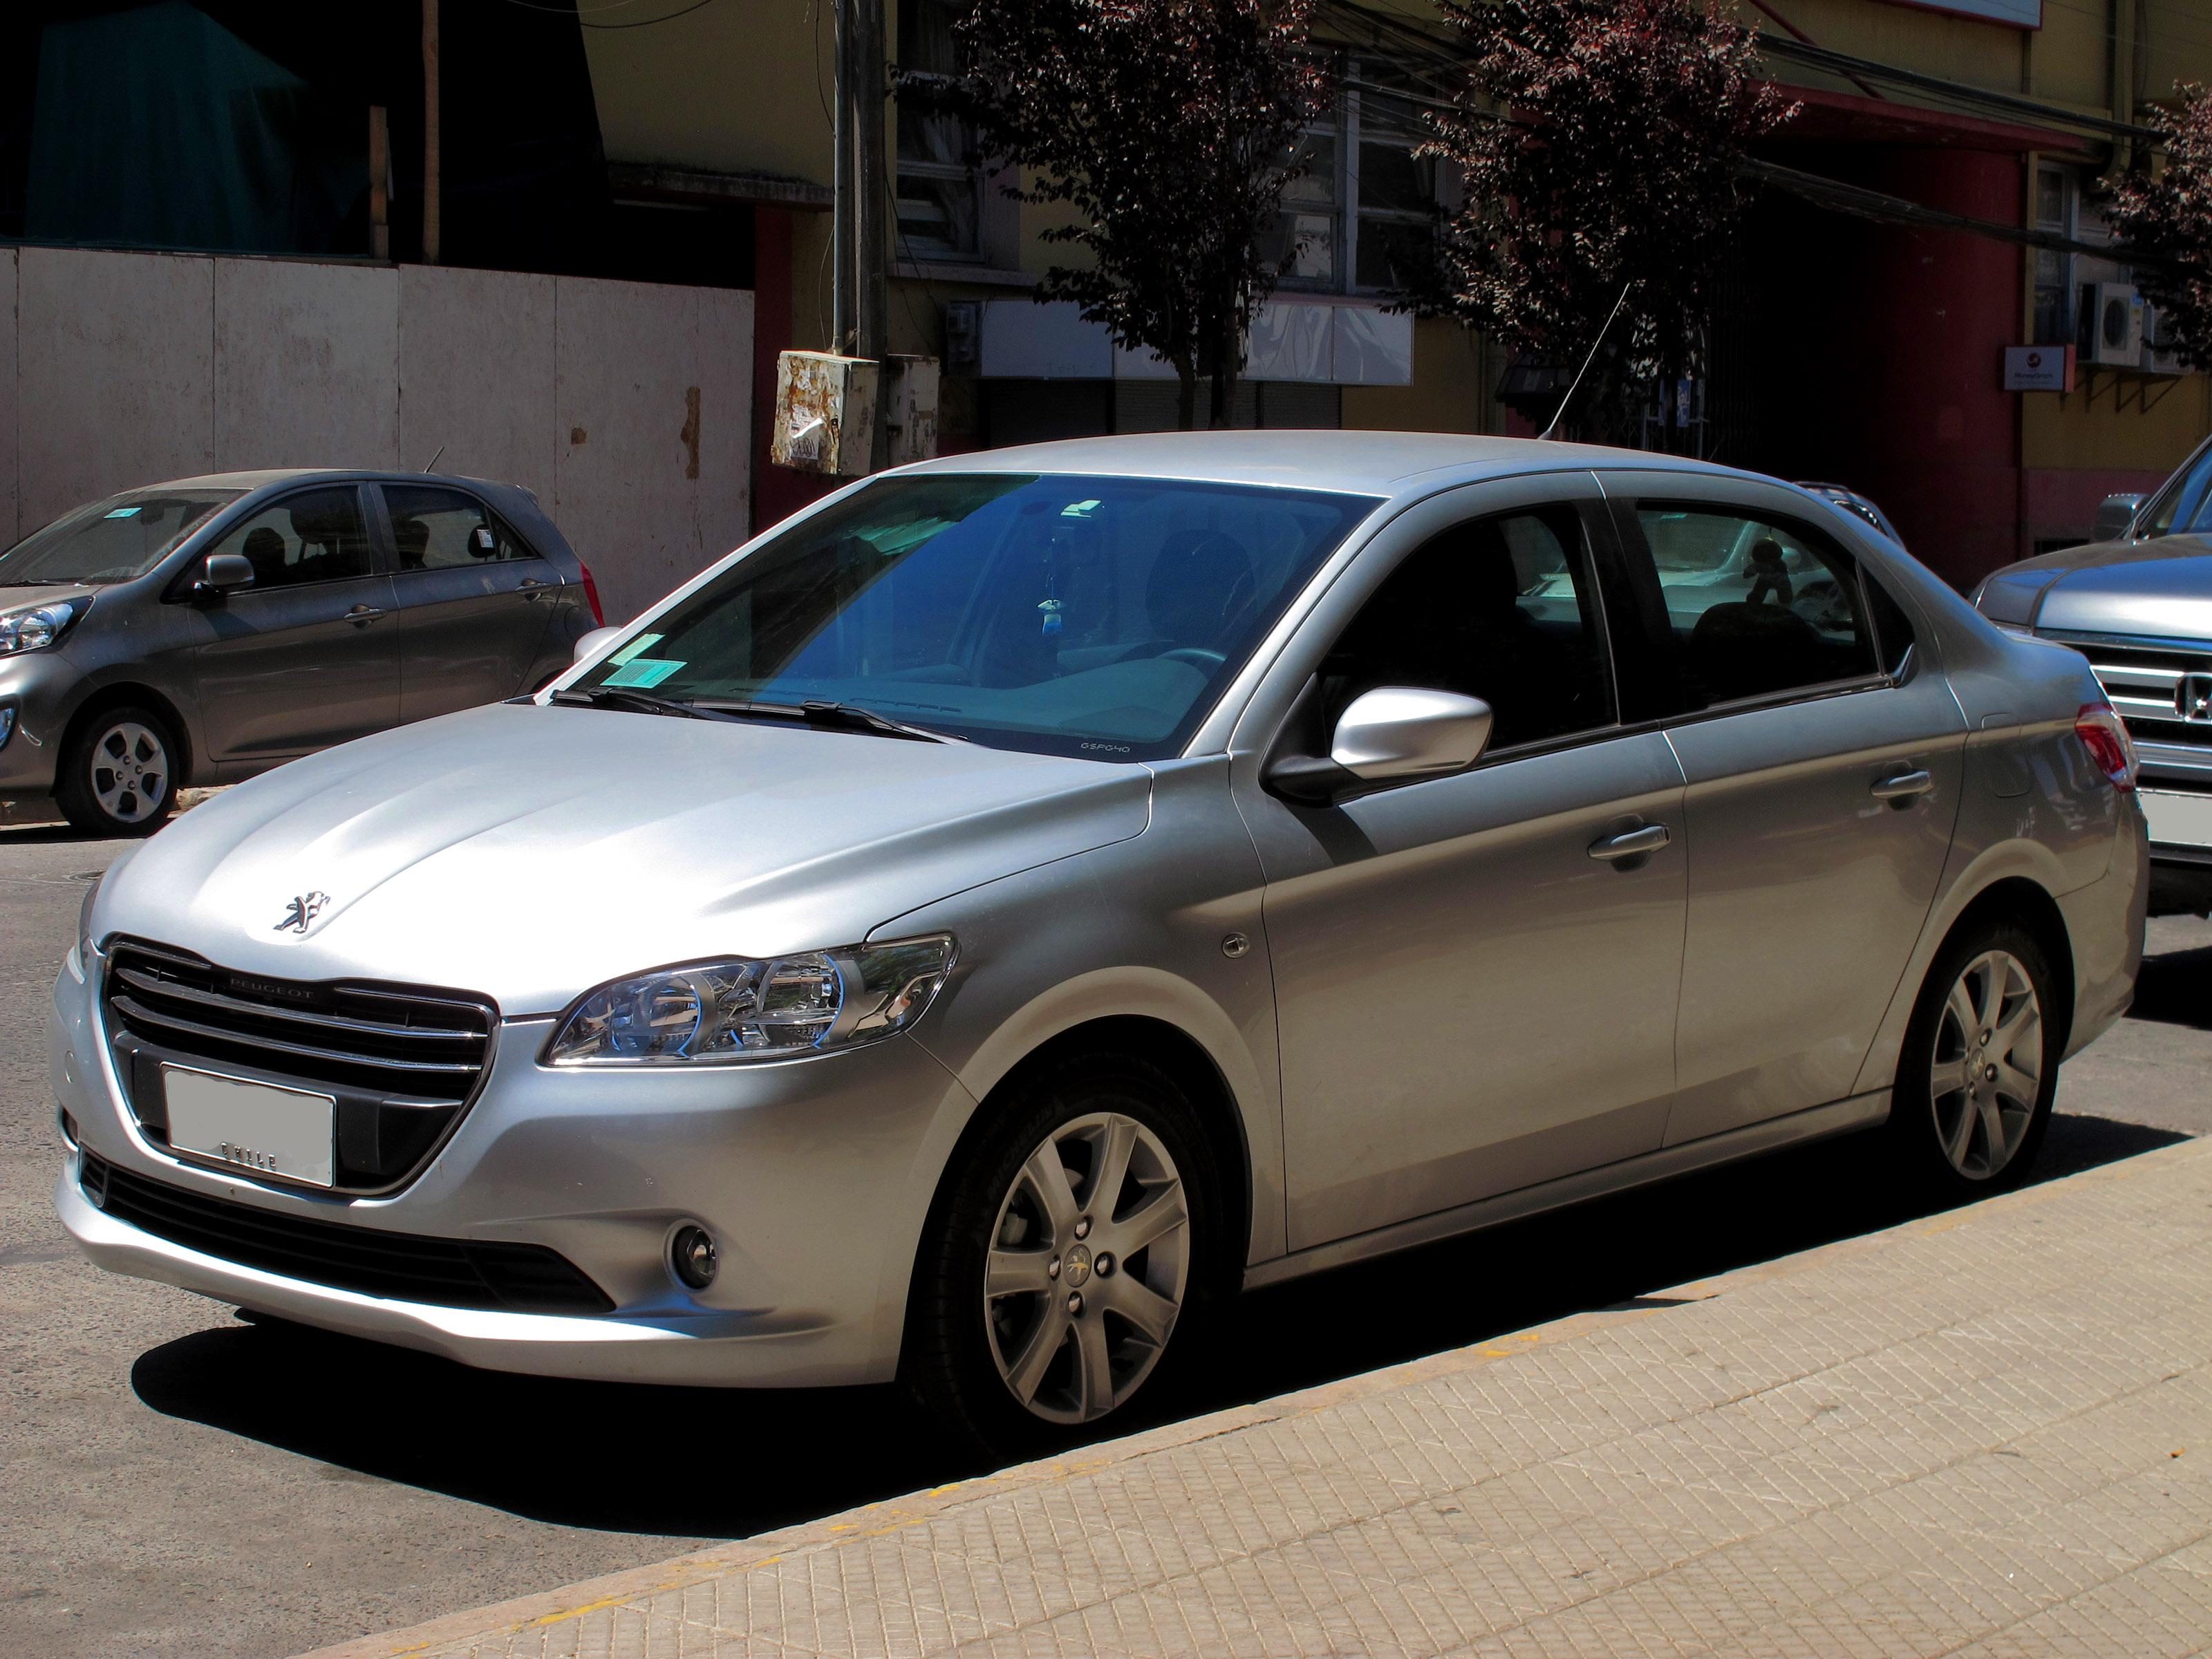 File:Peugeot 301 1.6 HDi Allure 2014 (19149680399).jpg - Wikimedia